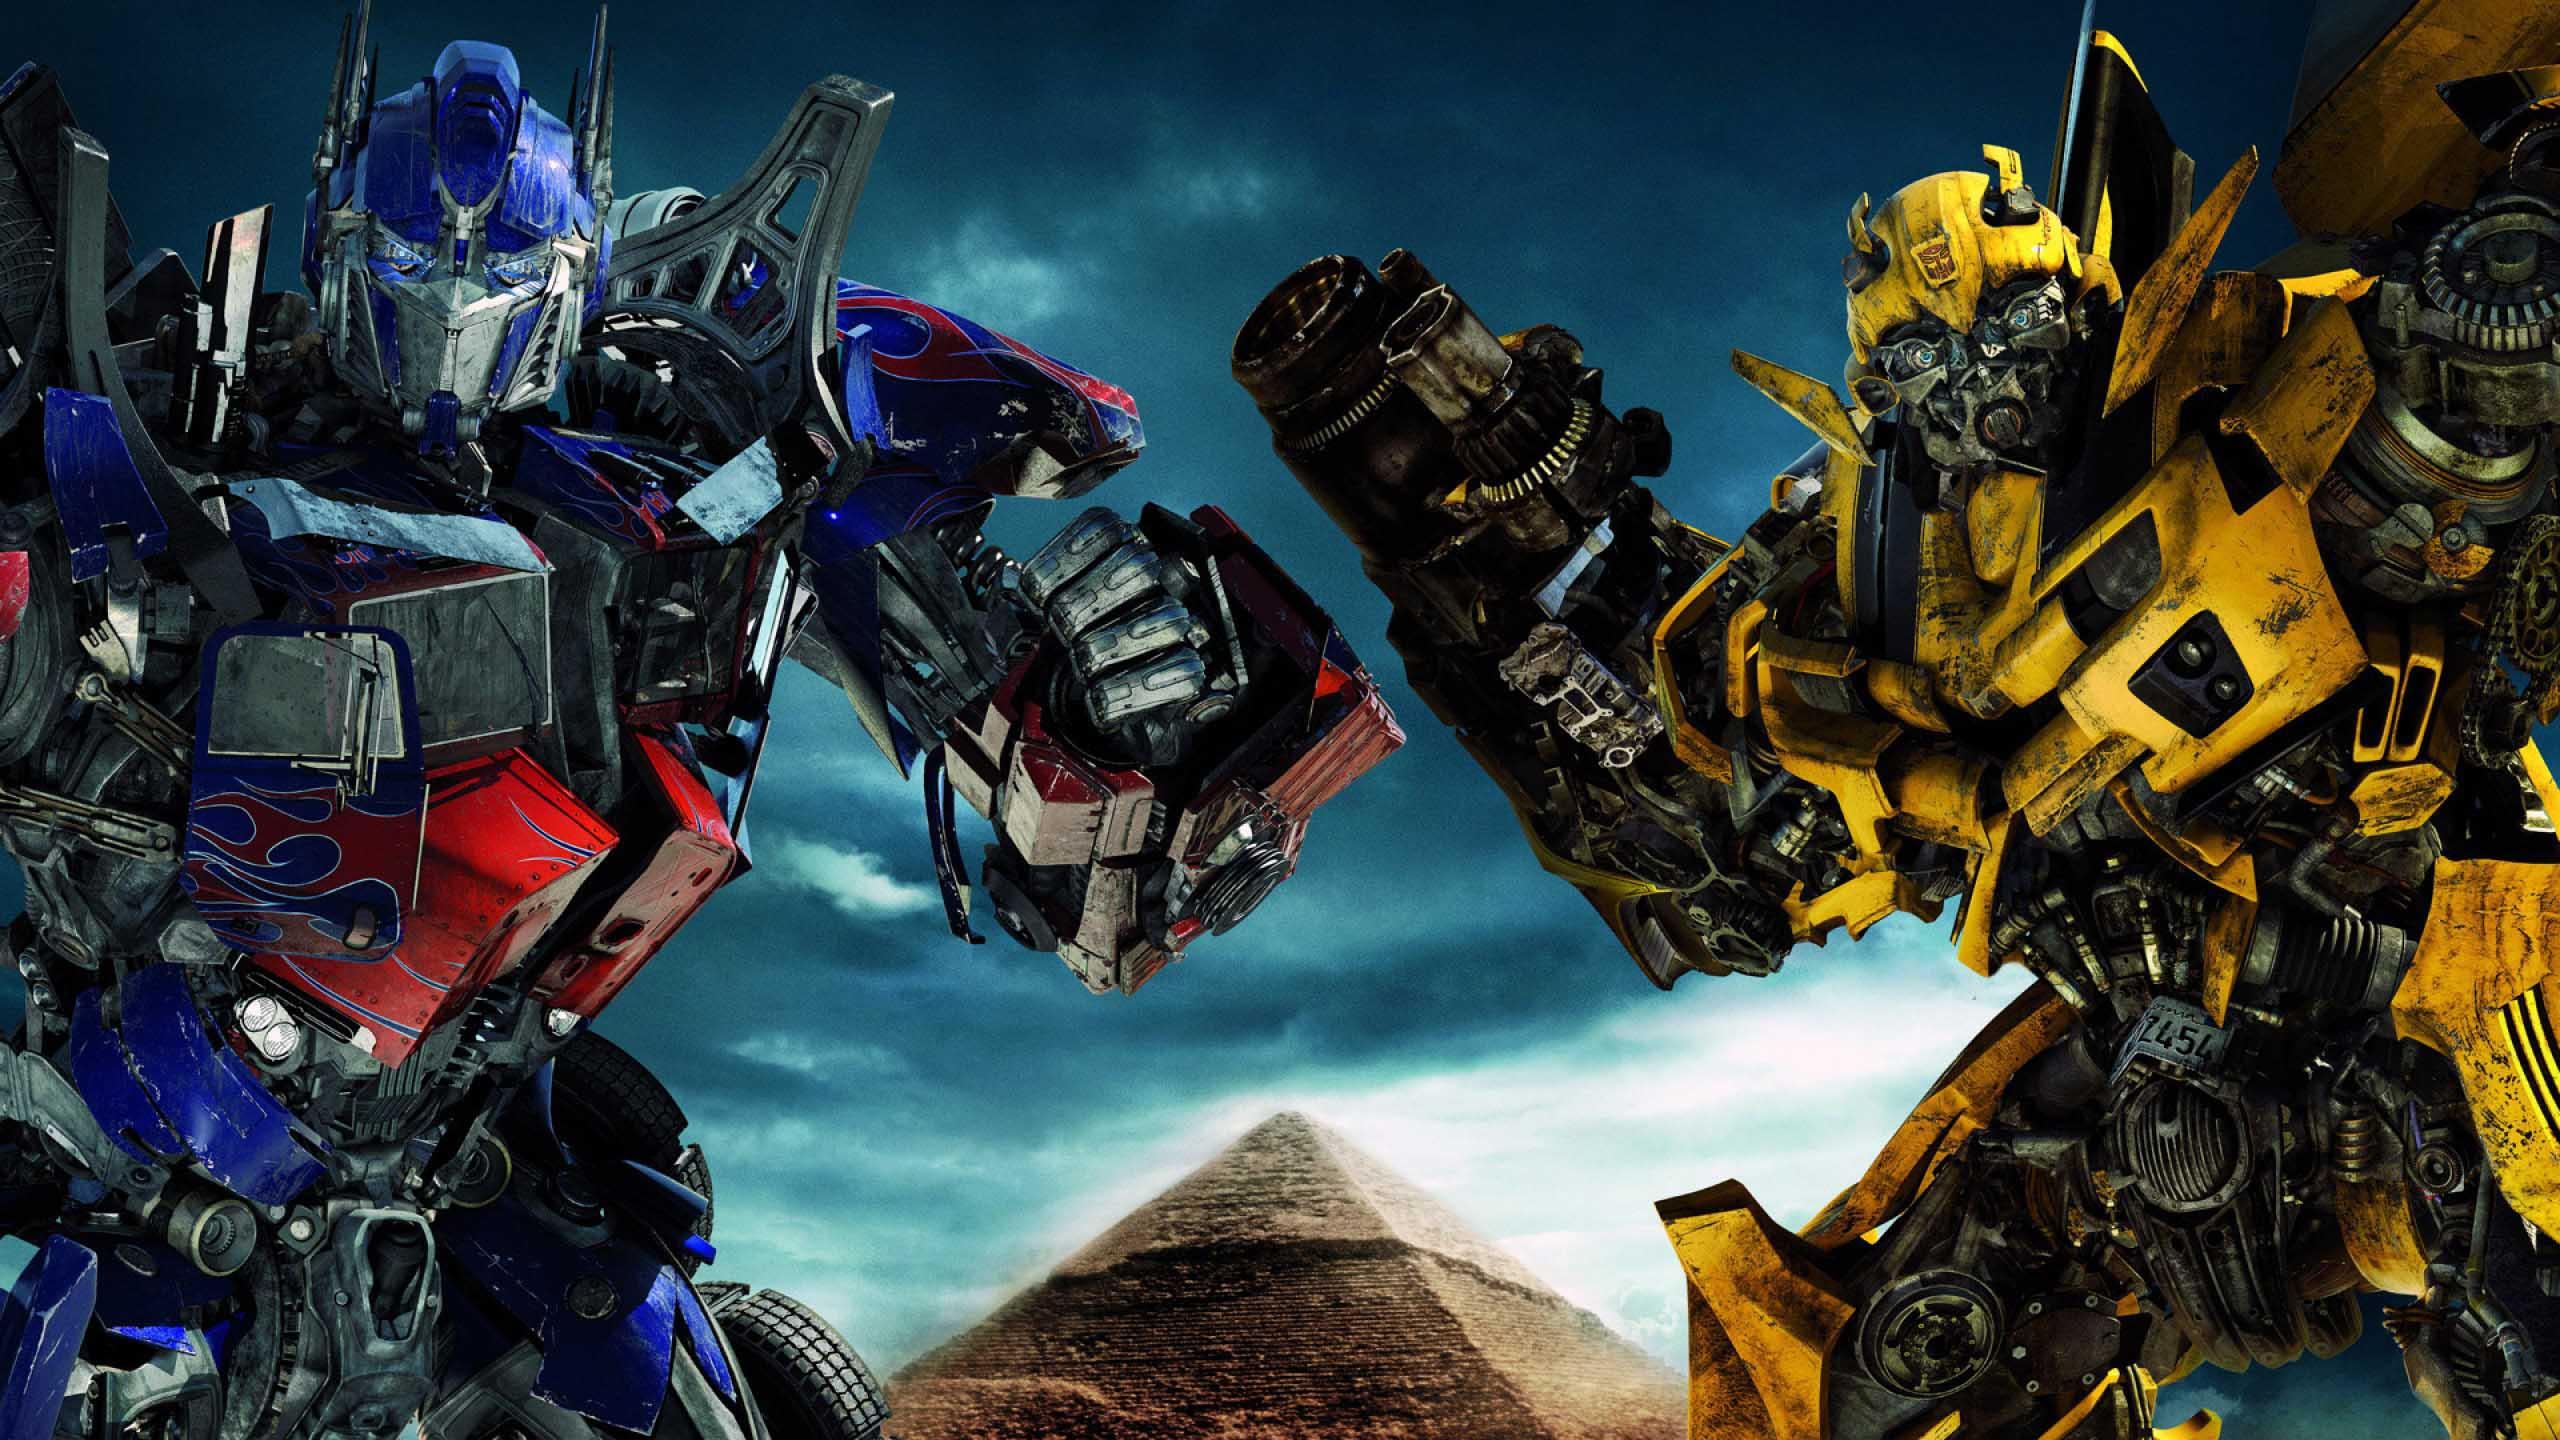 Wallpapers Transformers Optimus Prime Group (91+)